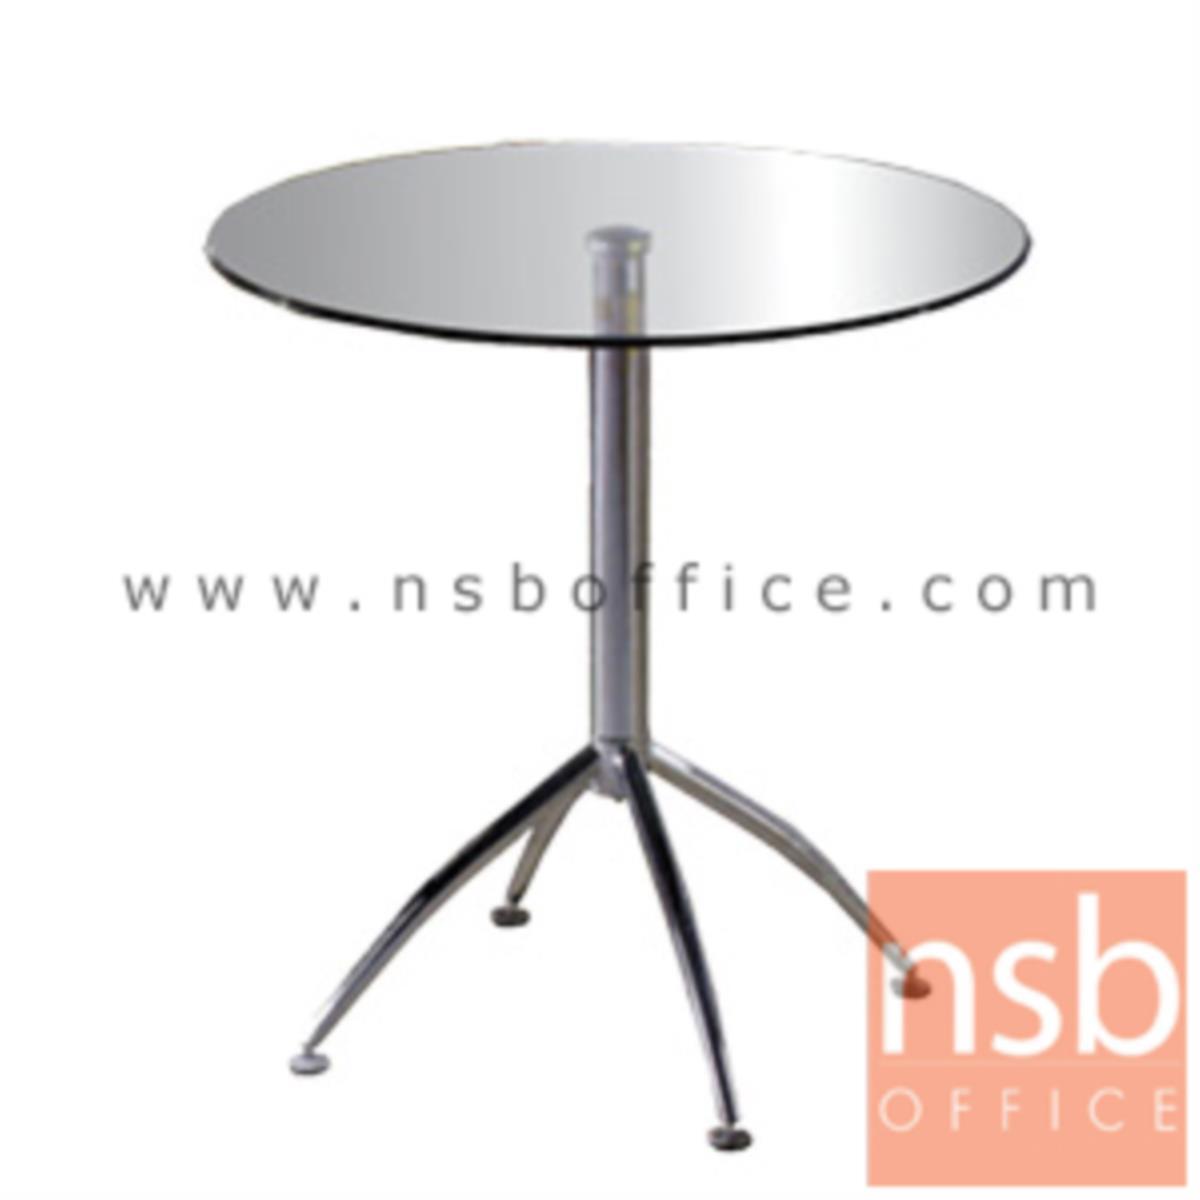 A09A110:โต๊ะกลมหน้ากระจก รุ่น Murray (เมอร์เรย์) ขนาด 70Di cm.  ขาเหล็กชุบโครเมี่ยม